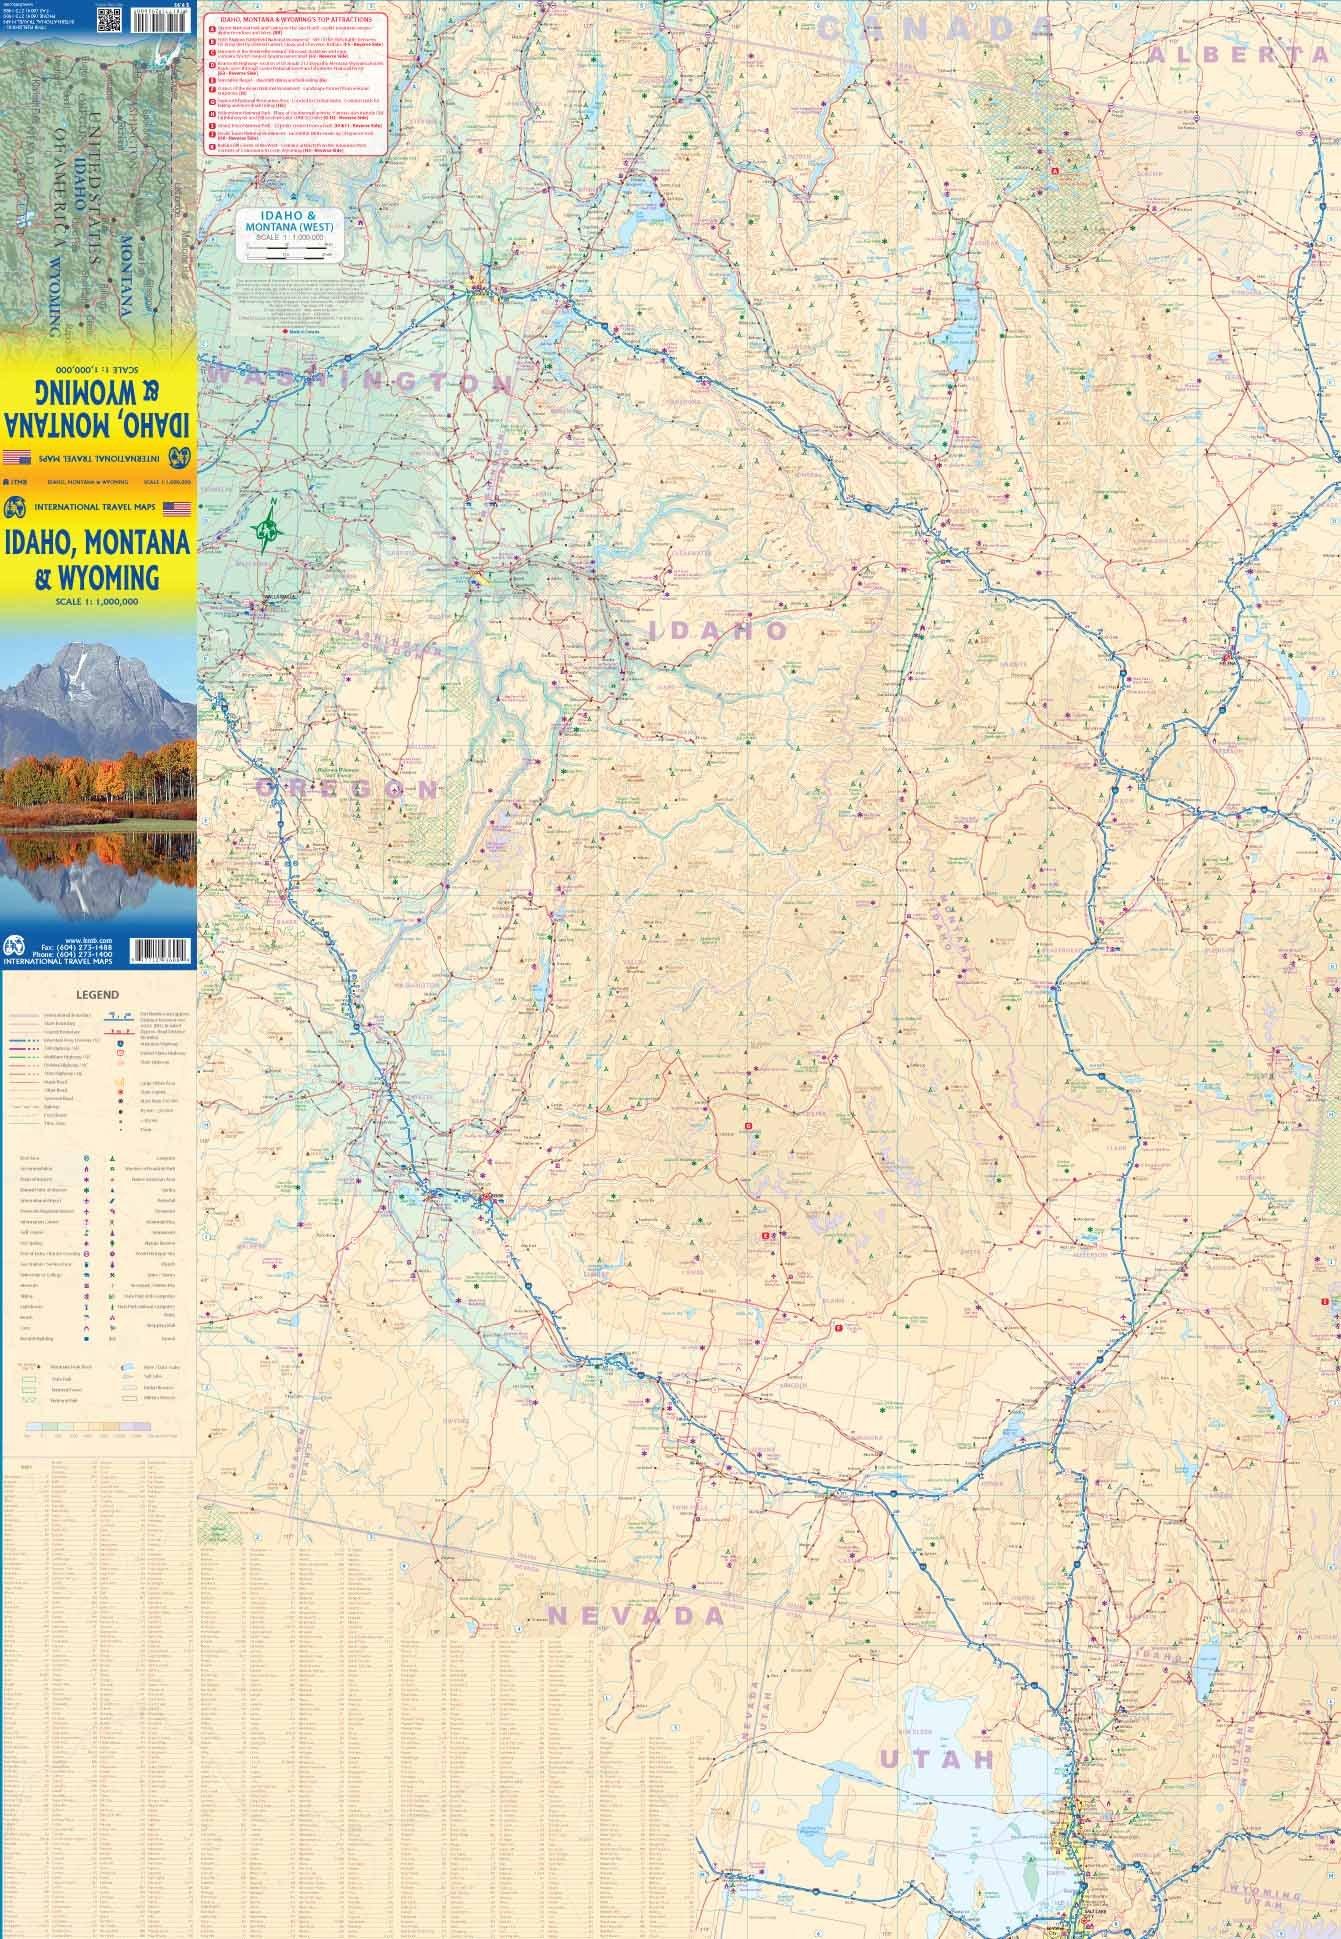 Montana And Idaho Map.Idaho Montana Wyoming Travel Reference Map Itmb Publishing Ltd